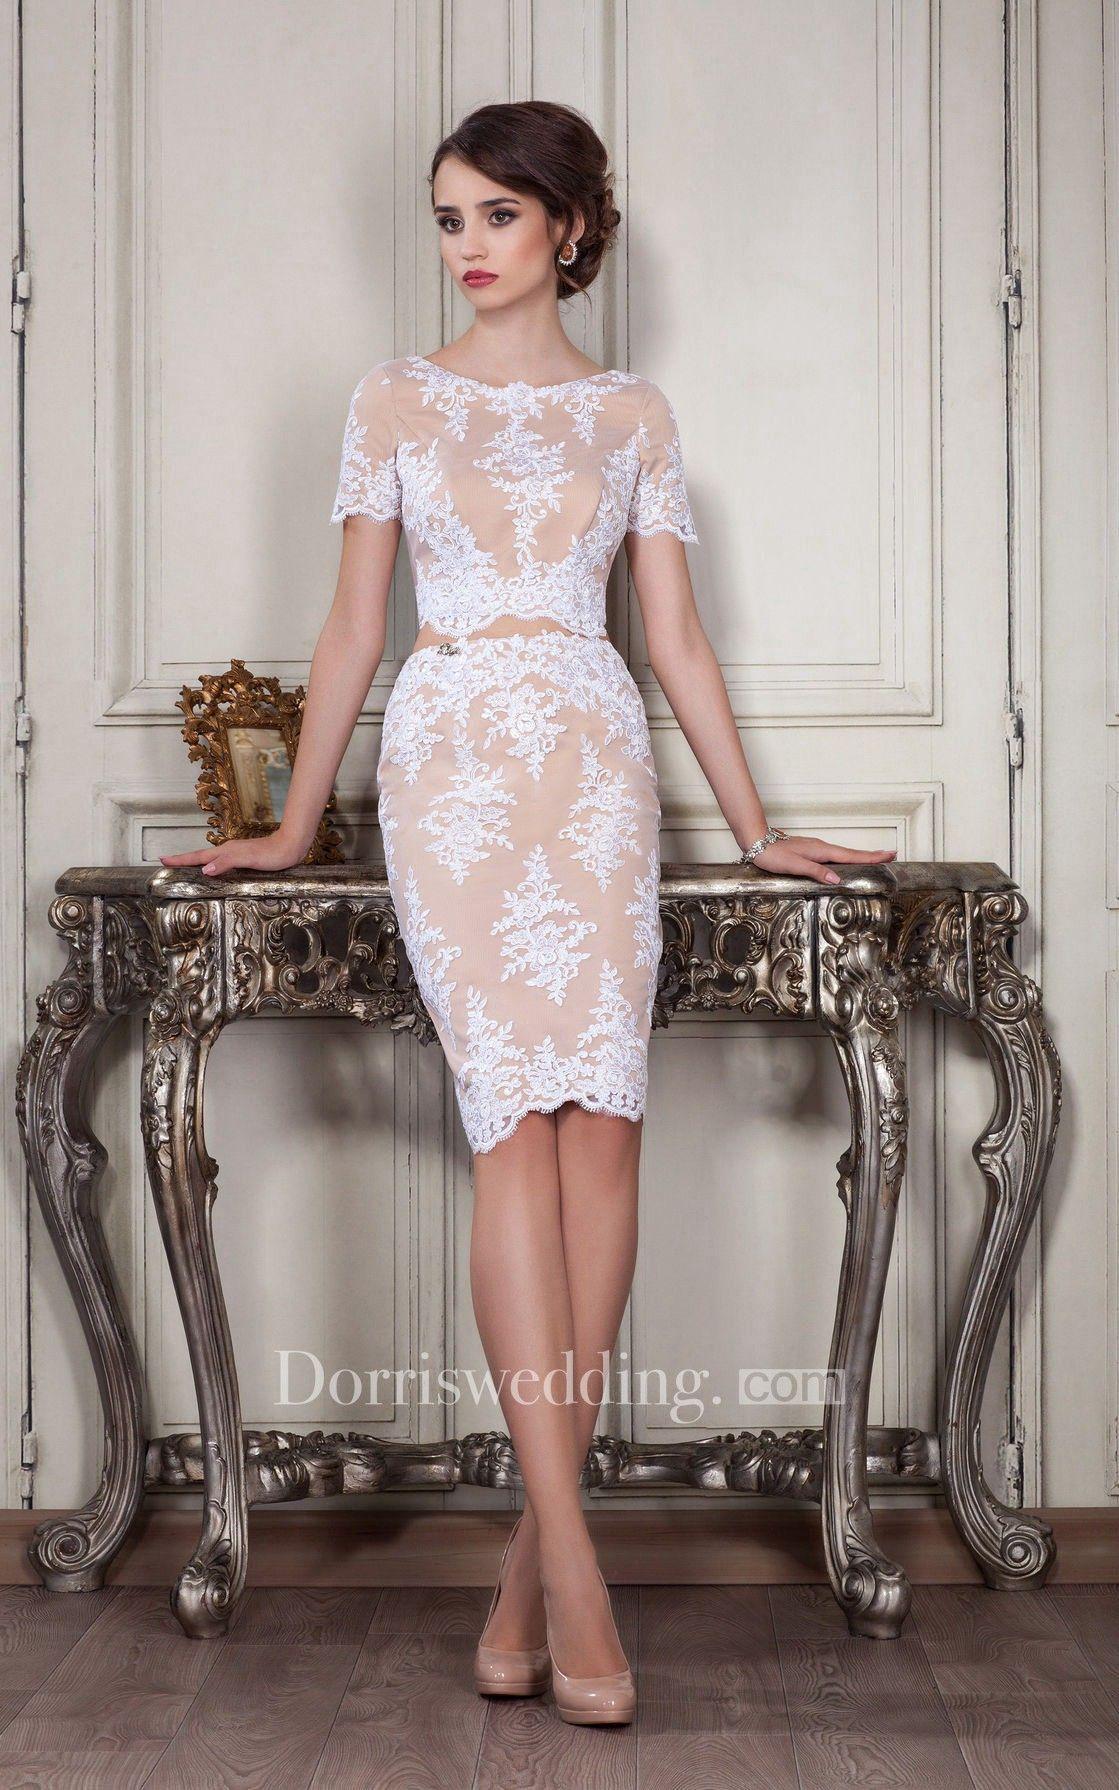 Sheath kneelength jewel short sleeve lace appliques zipper dress